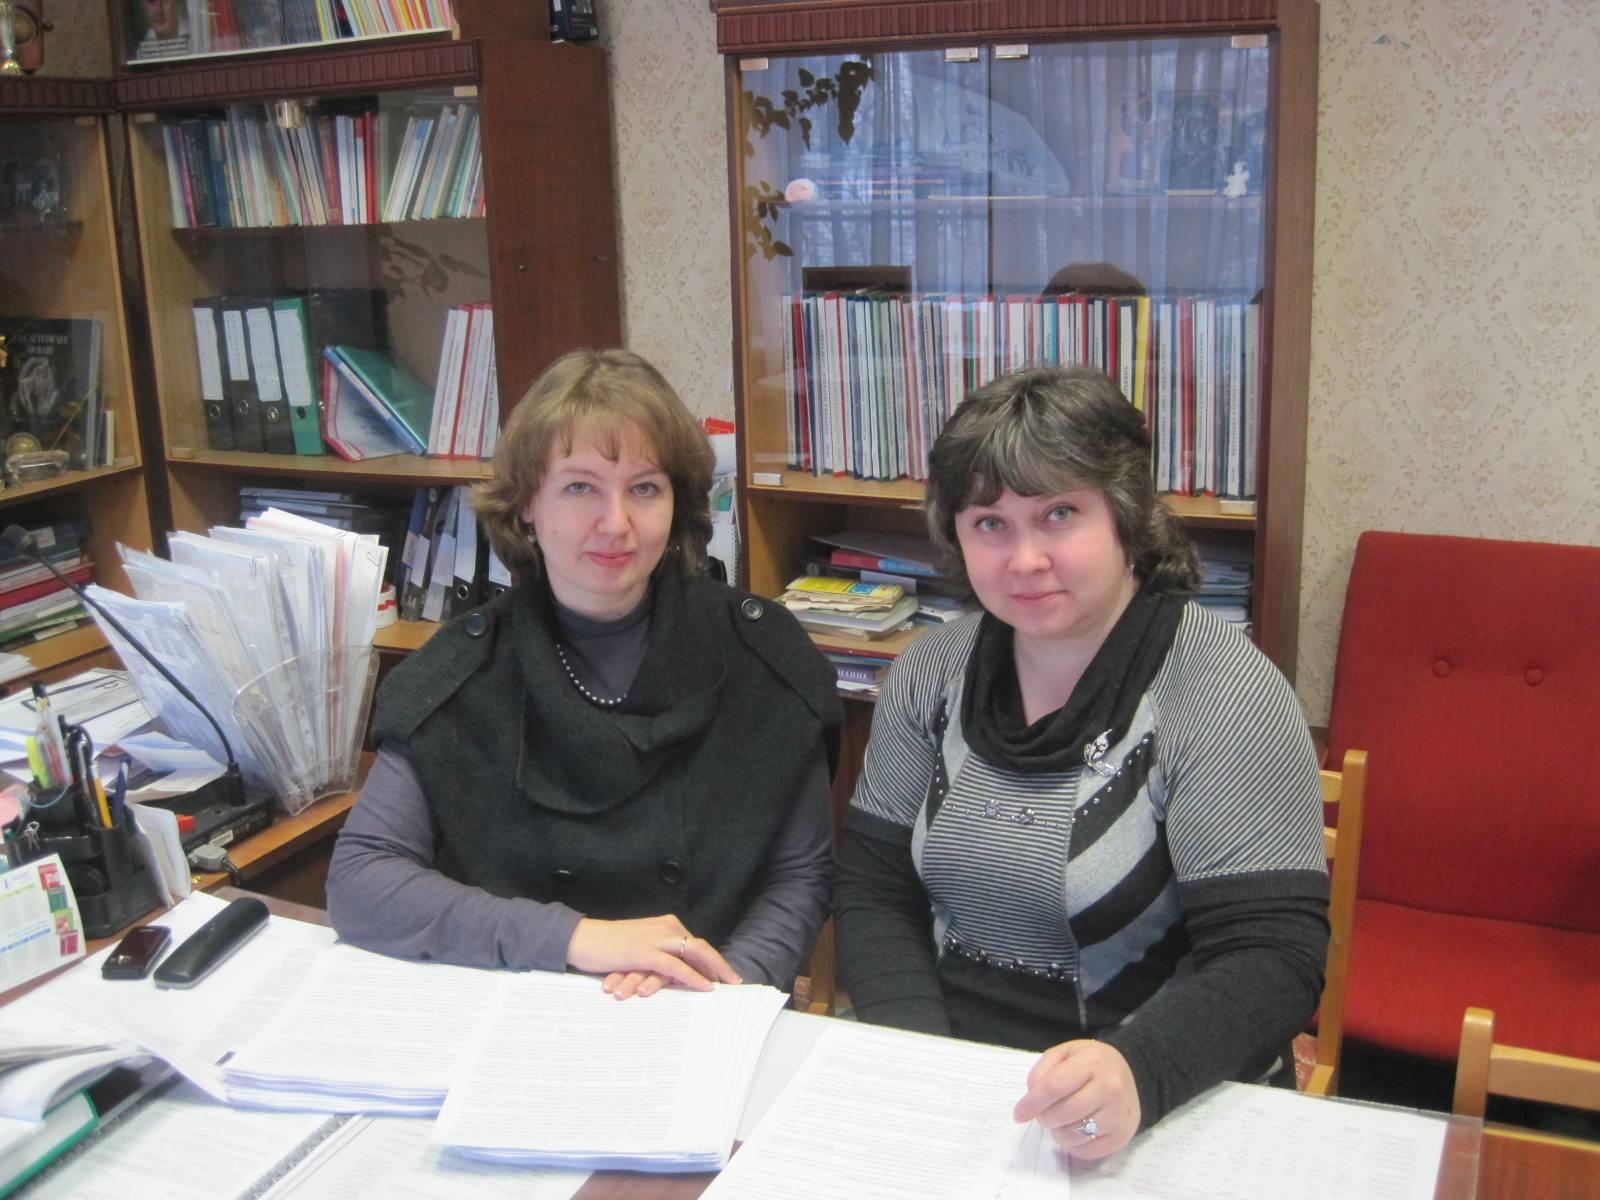 школа 1 александров учителя фото